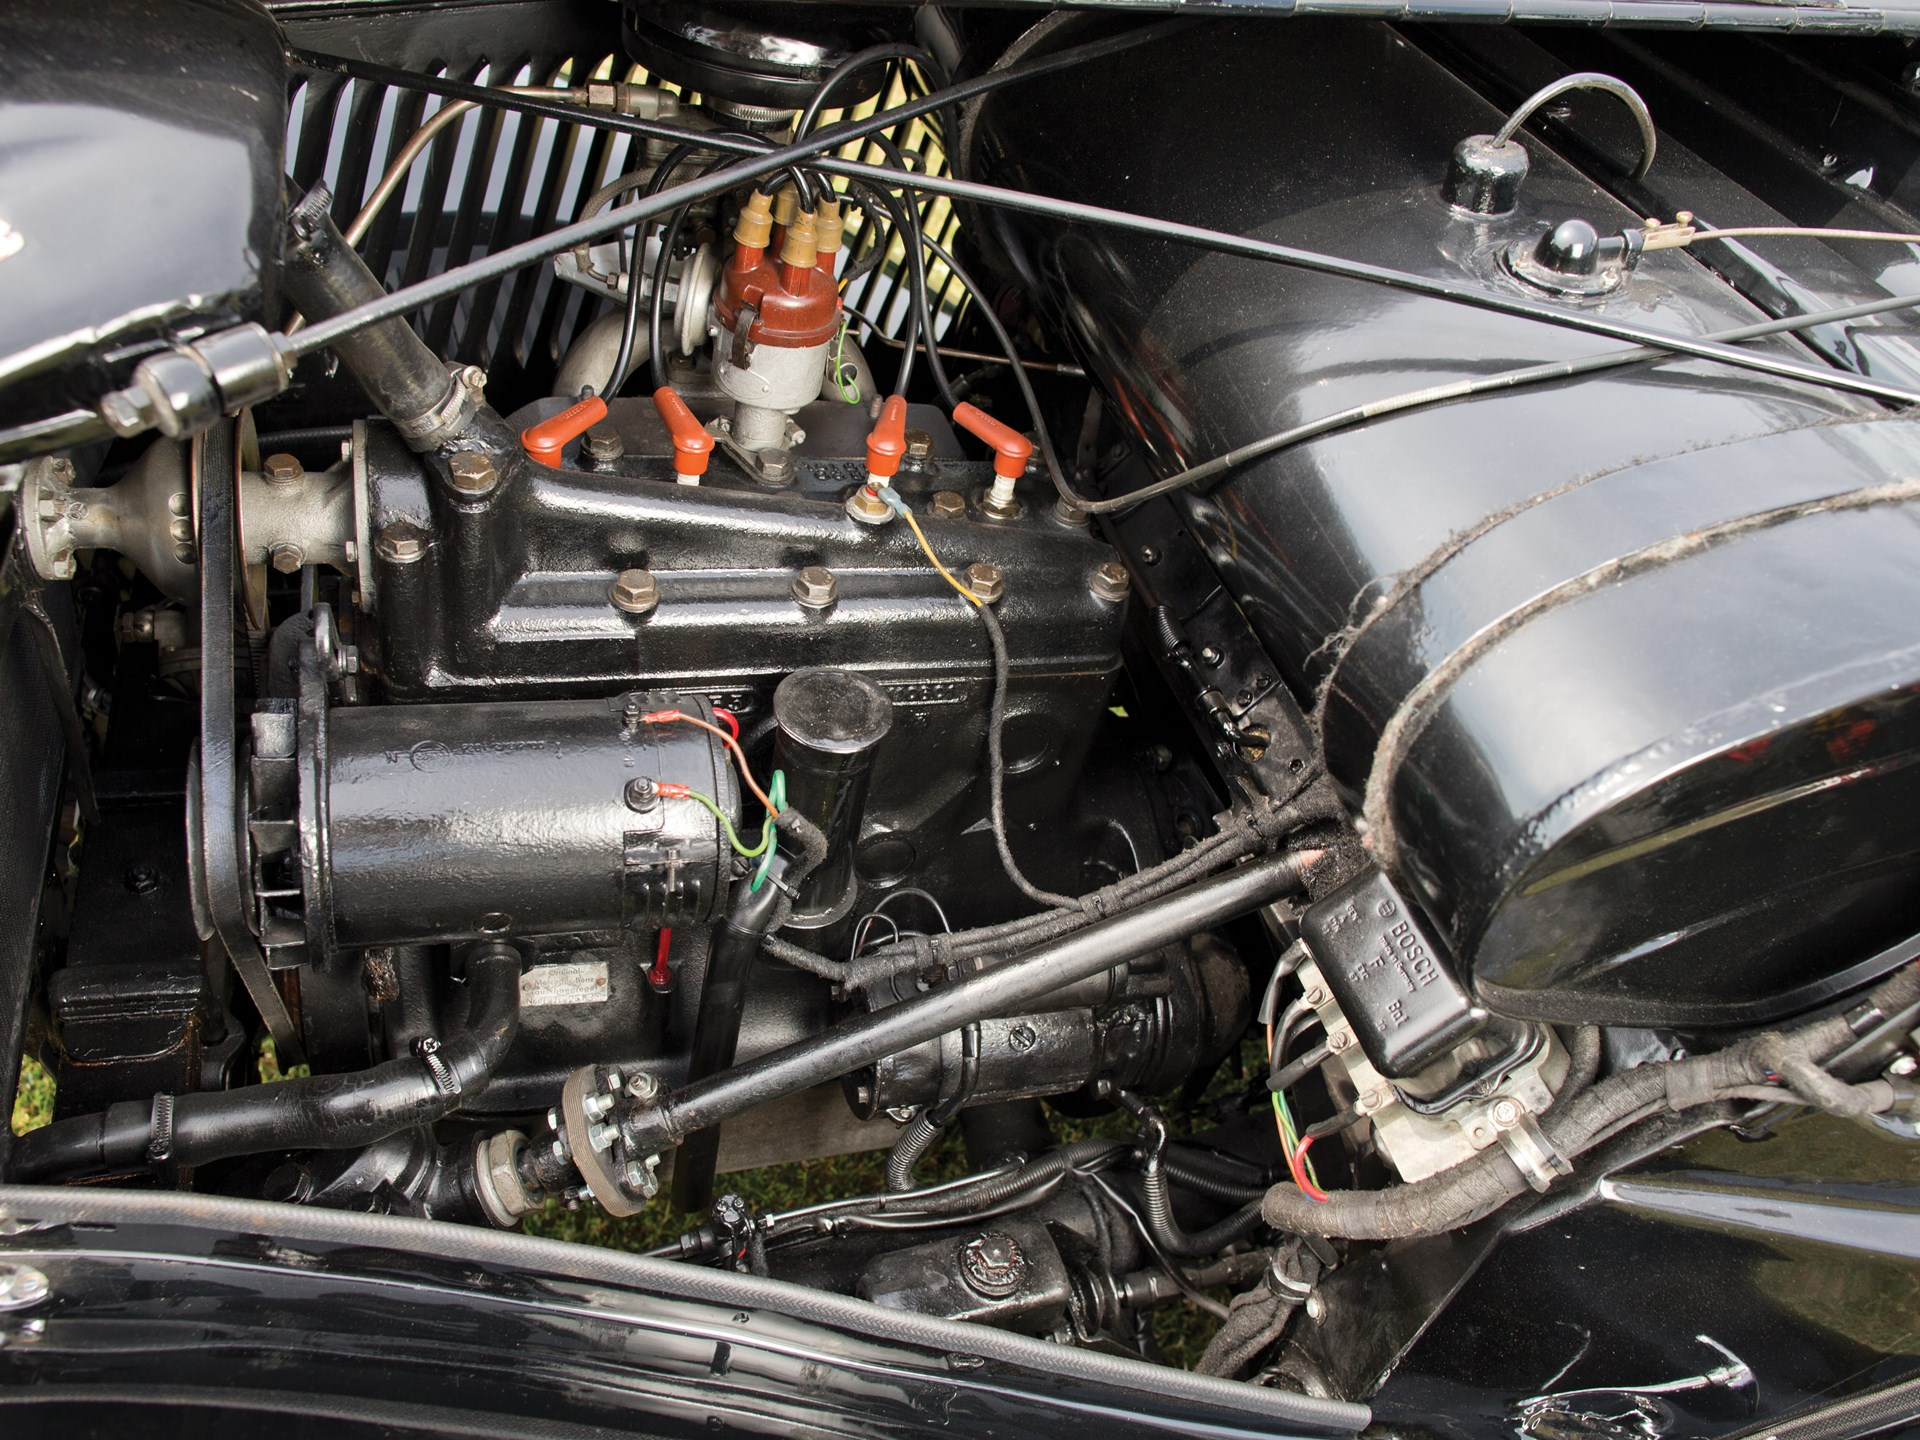 RM Sotheby's - 1939 Mercedes-Benz 170 V Cabriolet Saloon